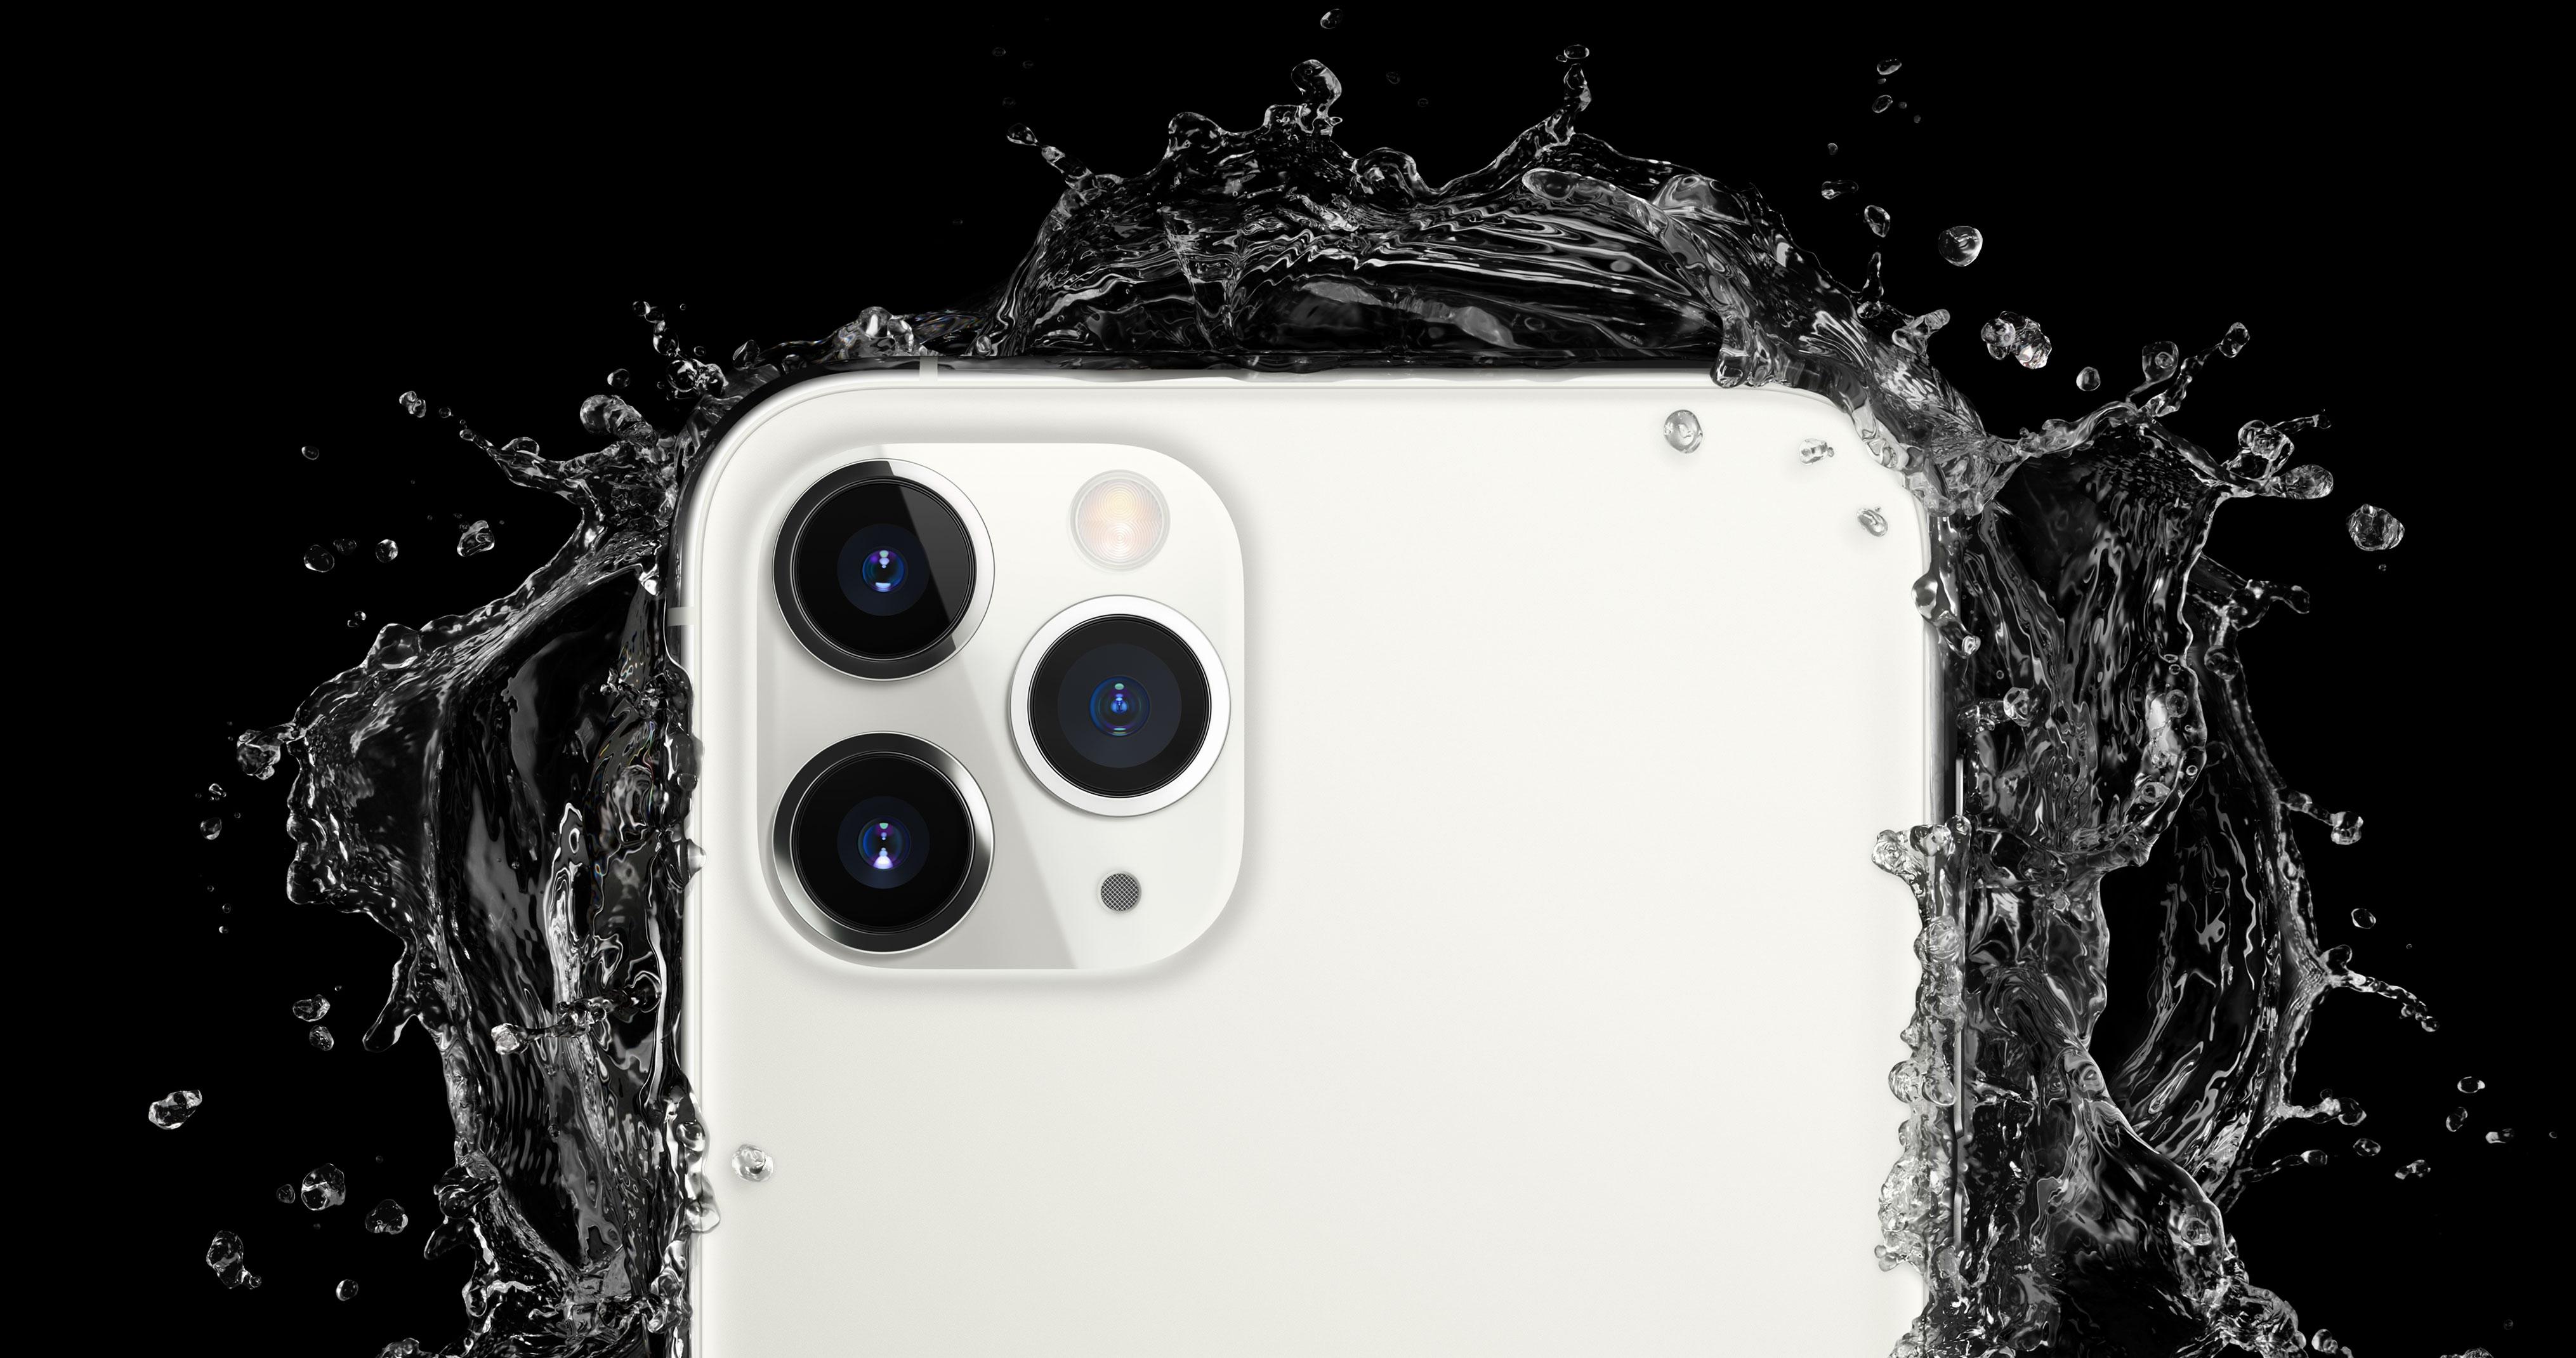 Apple continues photography push: iPad Pro gets 3 cameras, like iPhone 11 Pro   Digital Camera World